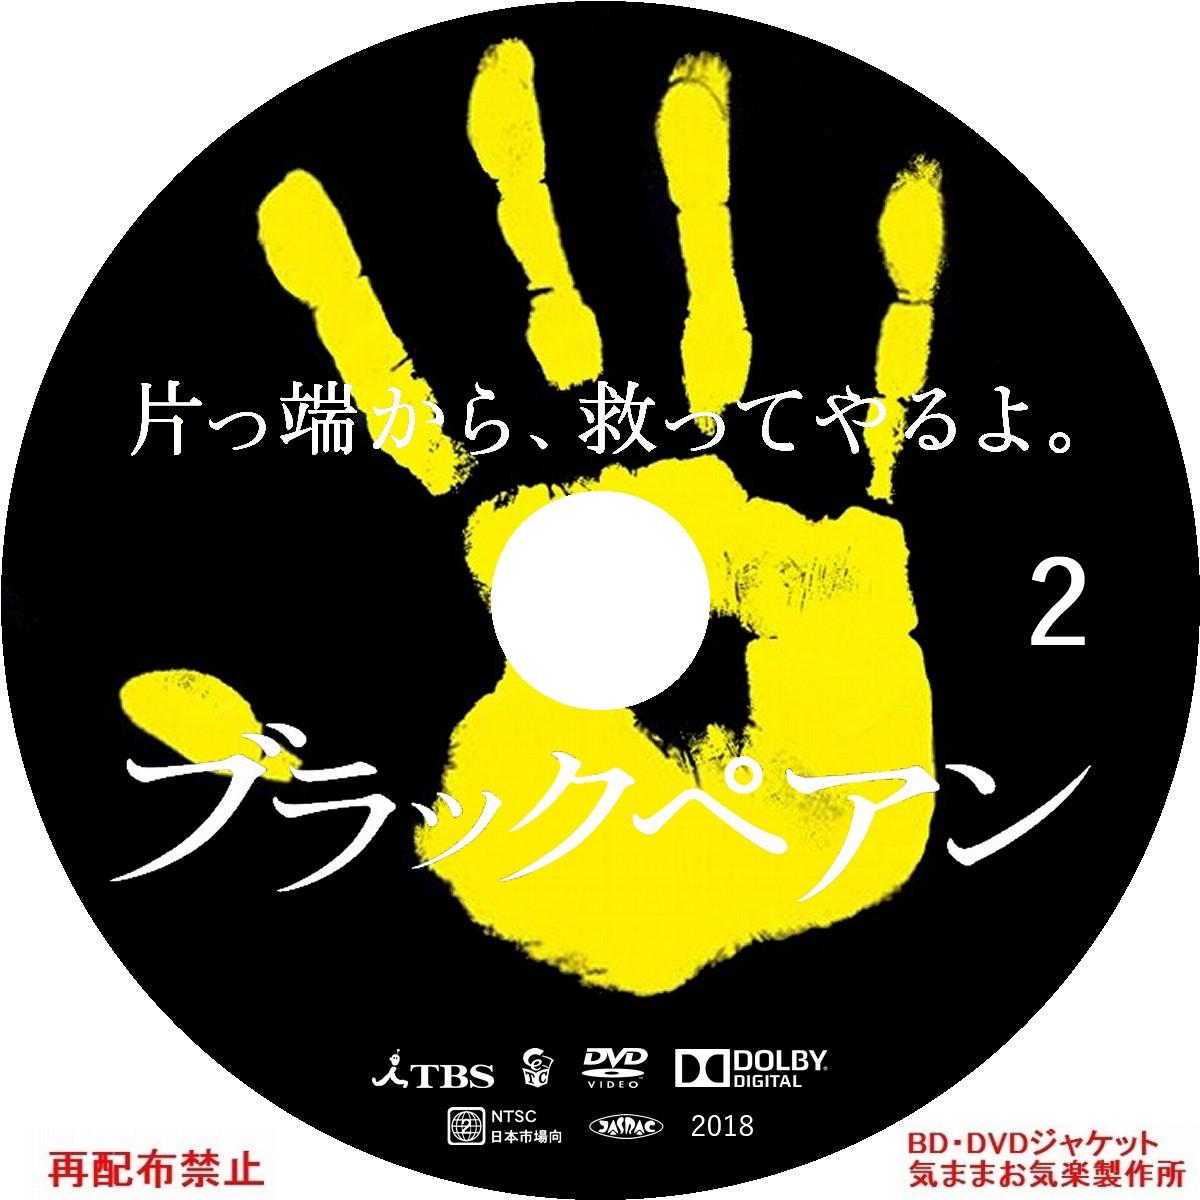 Black_pean_DVD02.jpg